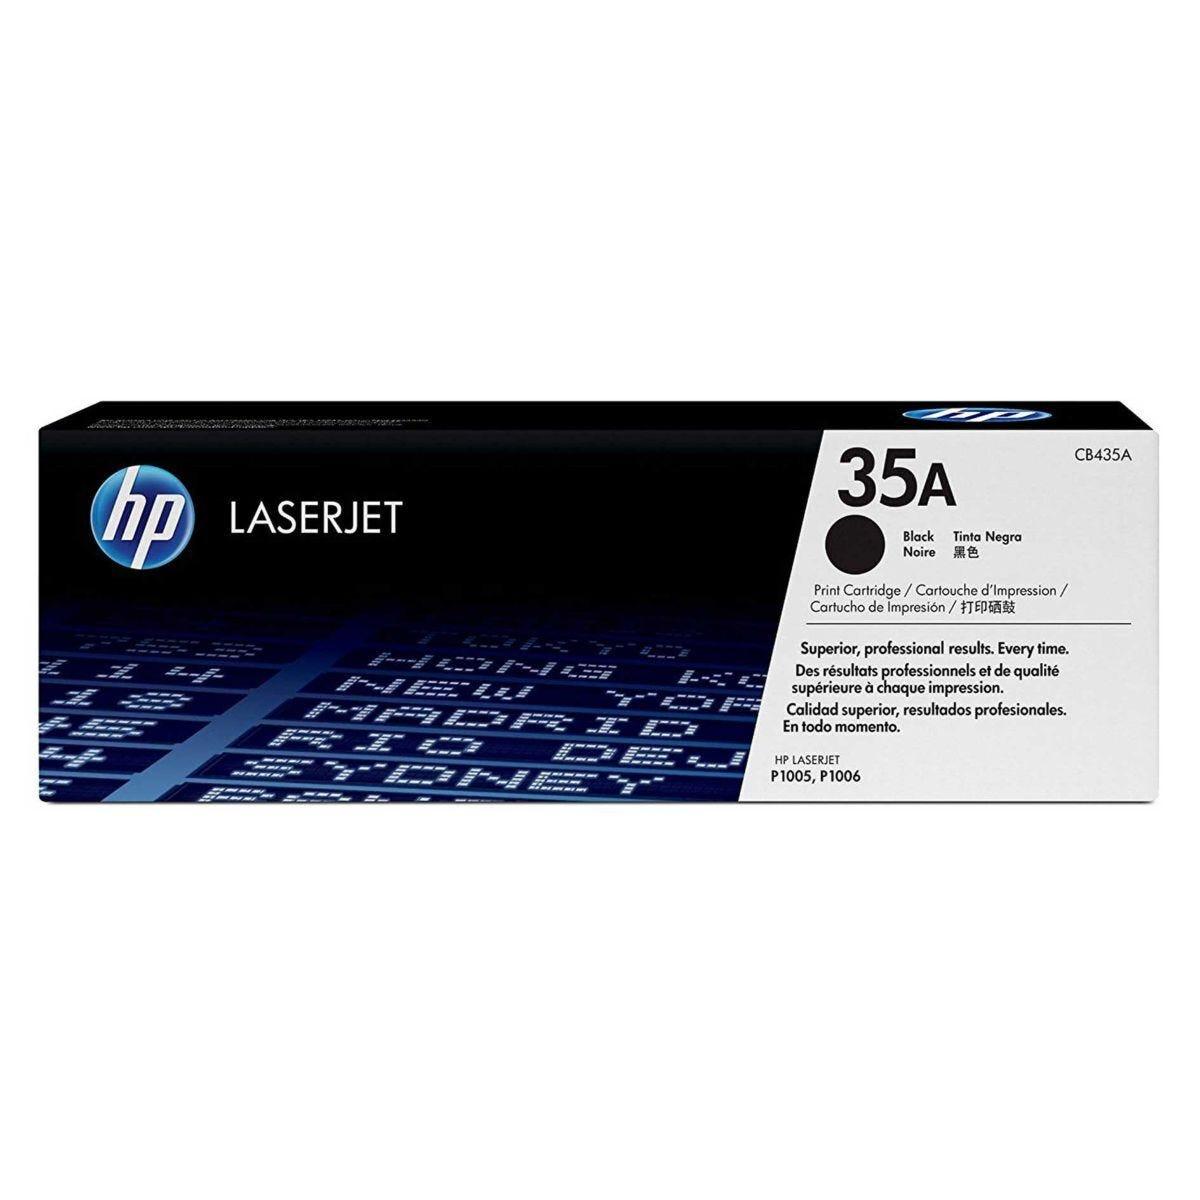 HP 35A Laser Printer Ink Toner Cartridge CB435A